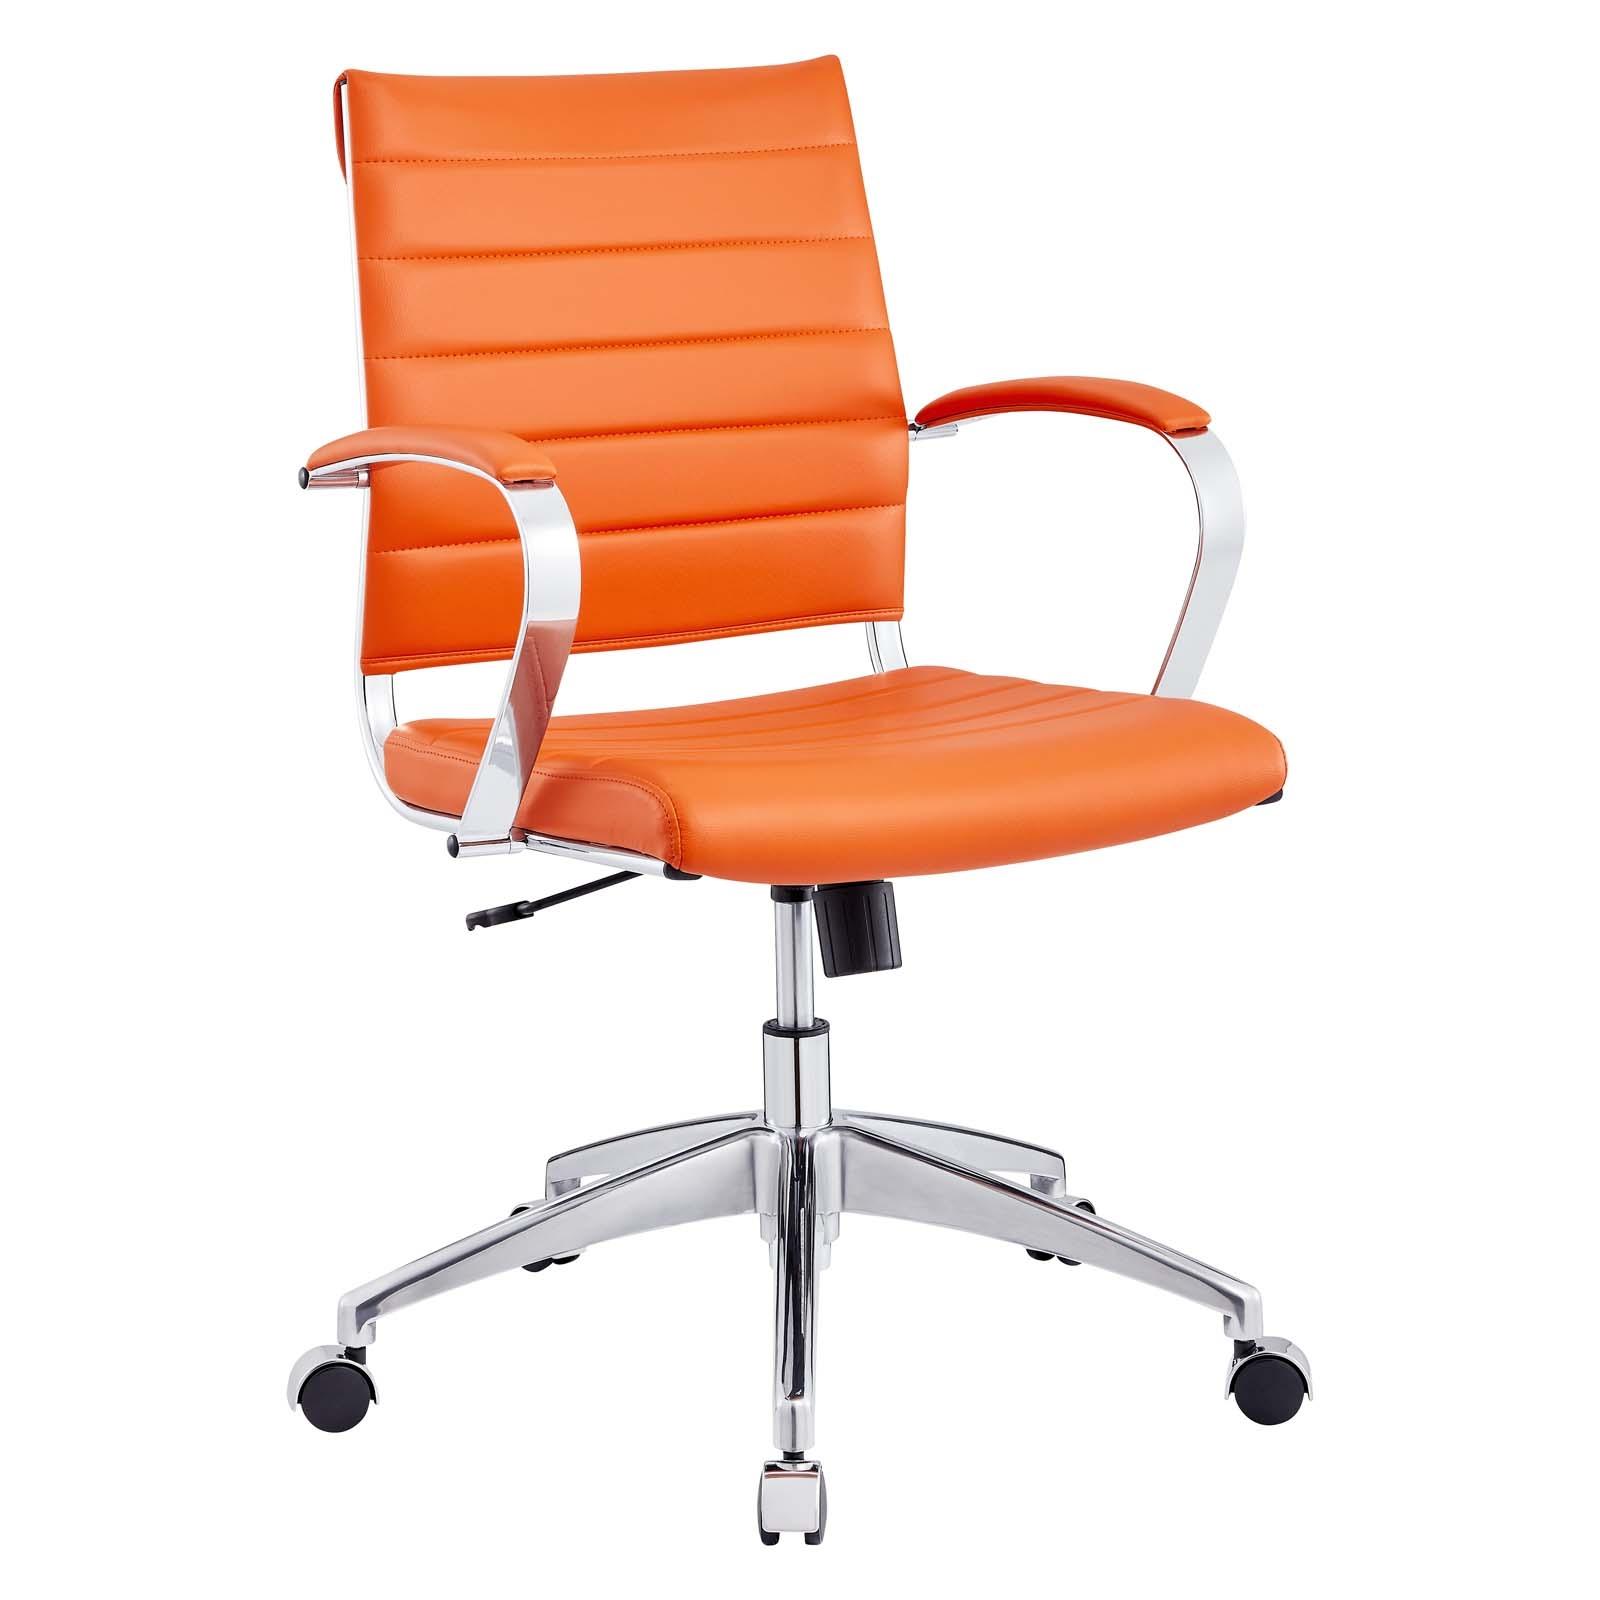 Back Office Chair in Orange